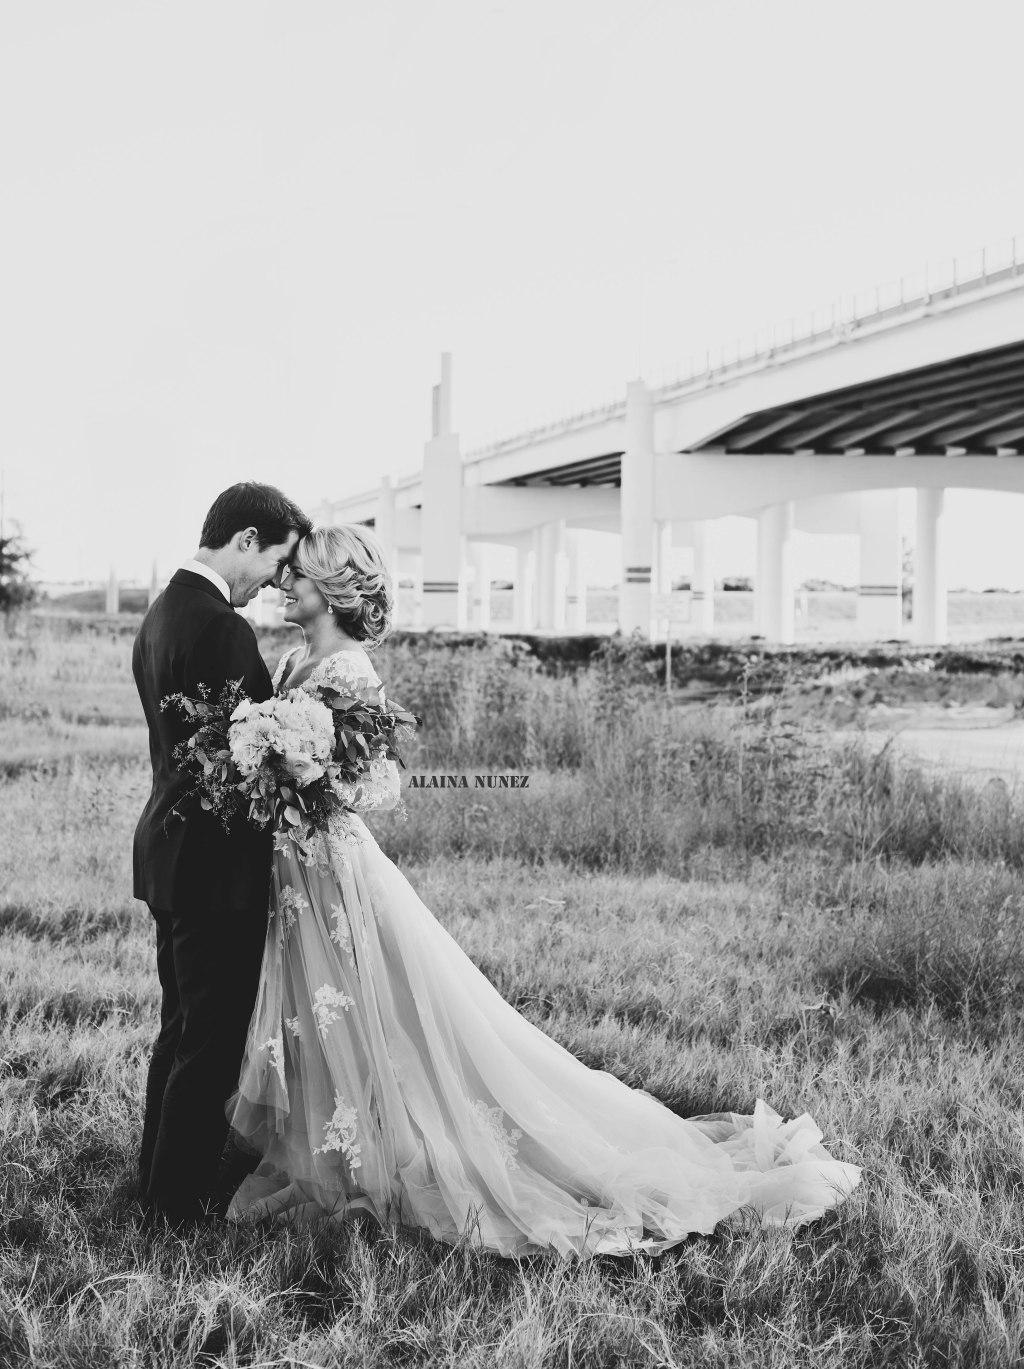 alainanunez-8-6-16-wedding-2web